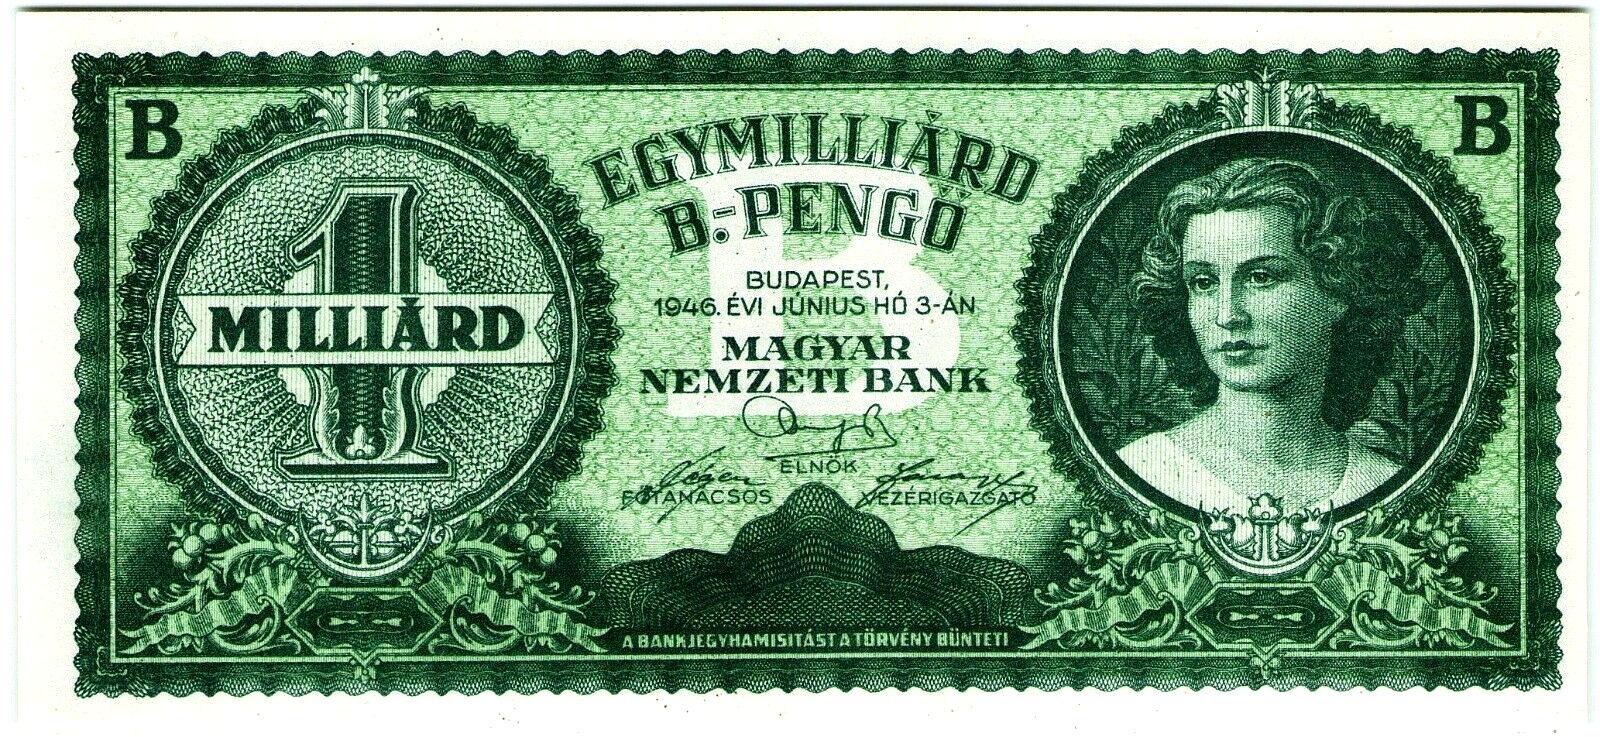 Hungary 1946 hyperinflation, 1 Milliard B-Pengő